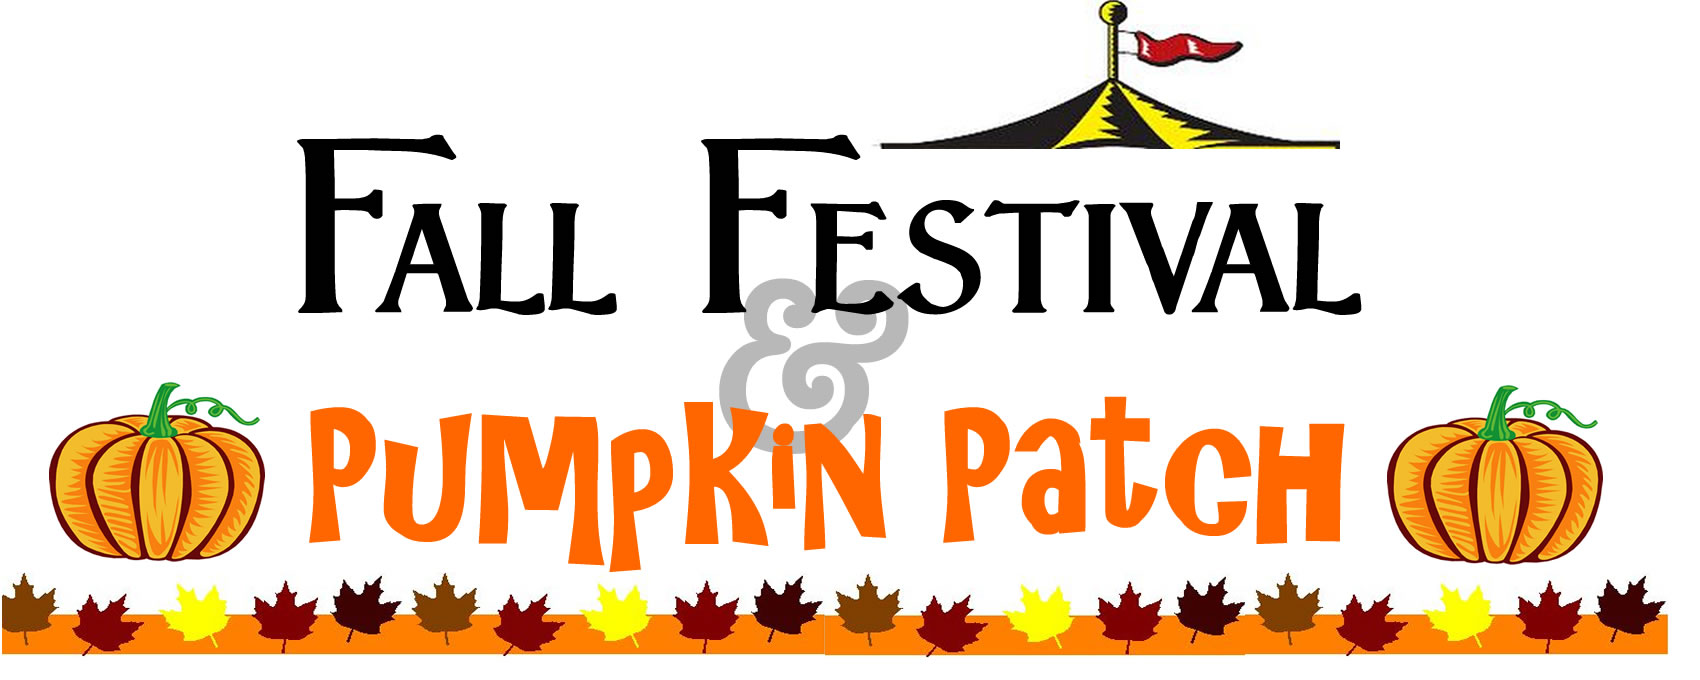 Fall Festival Clipart.